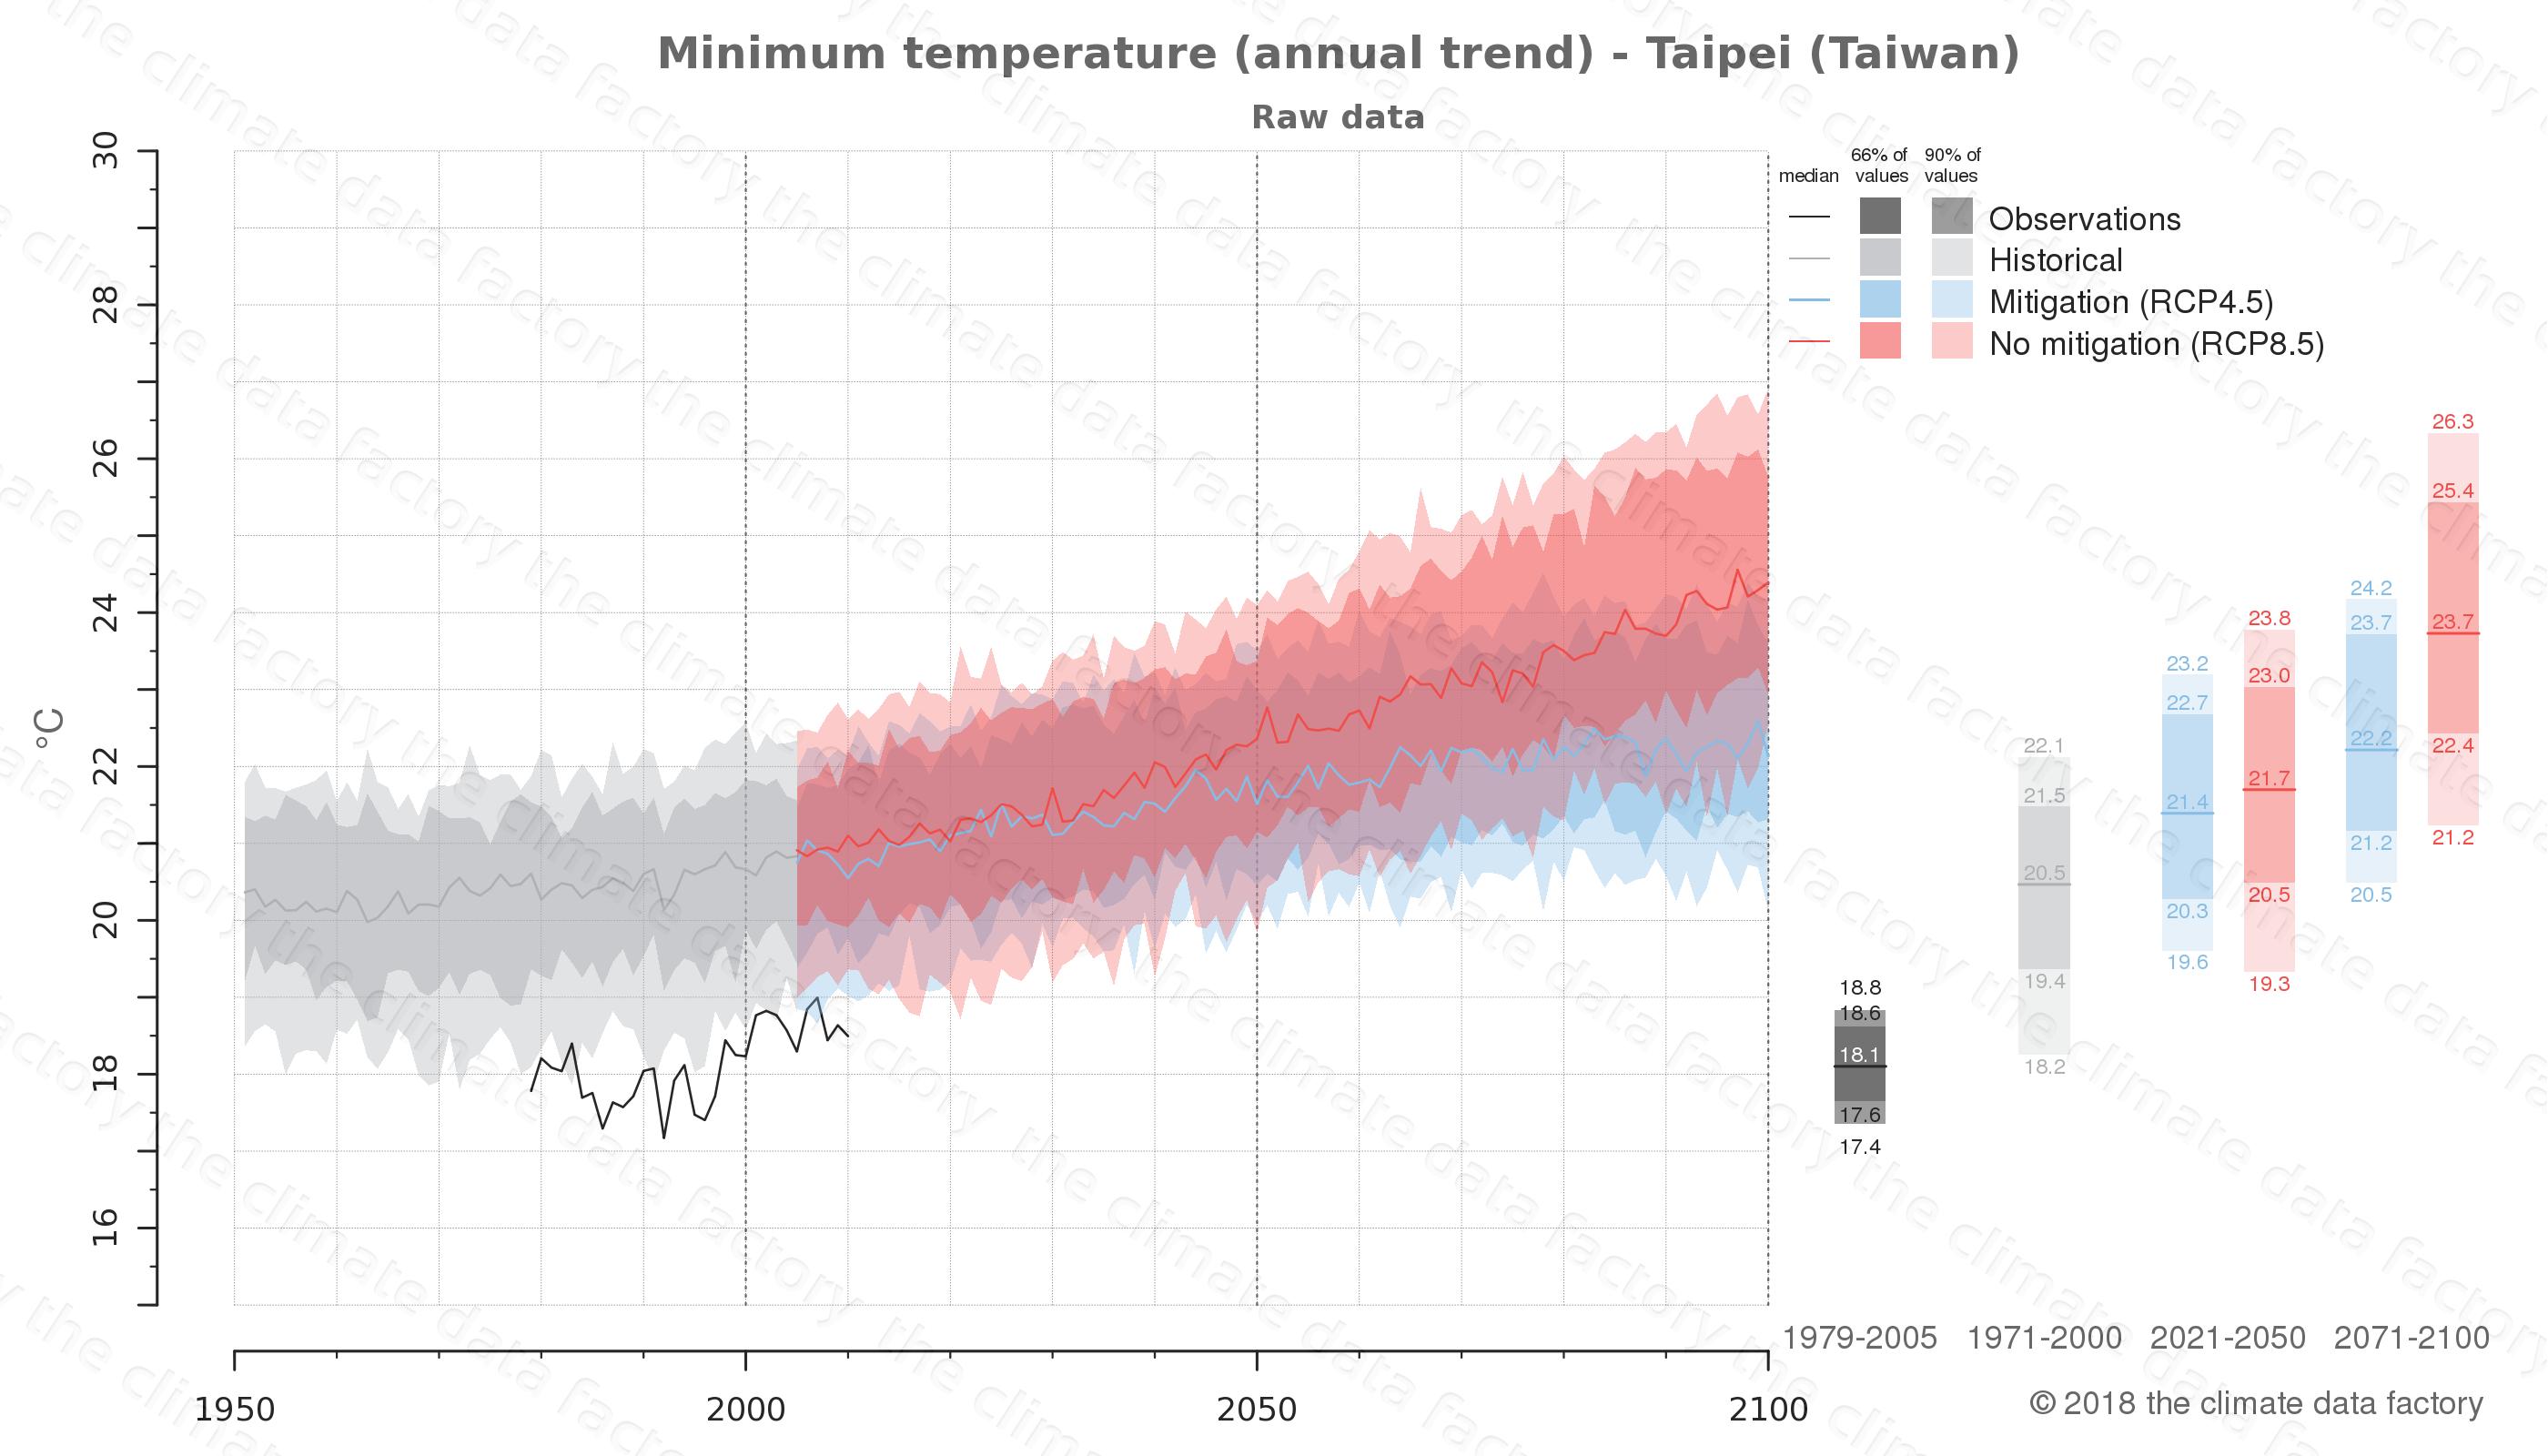 climate change data policy adaptation climate graph city data minimum-temperature taipei taiwan